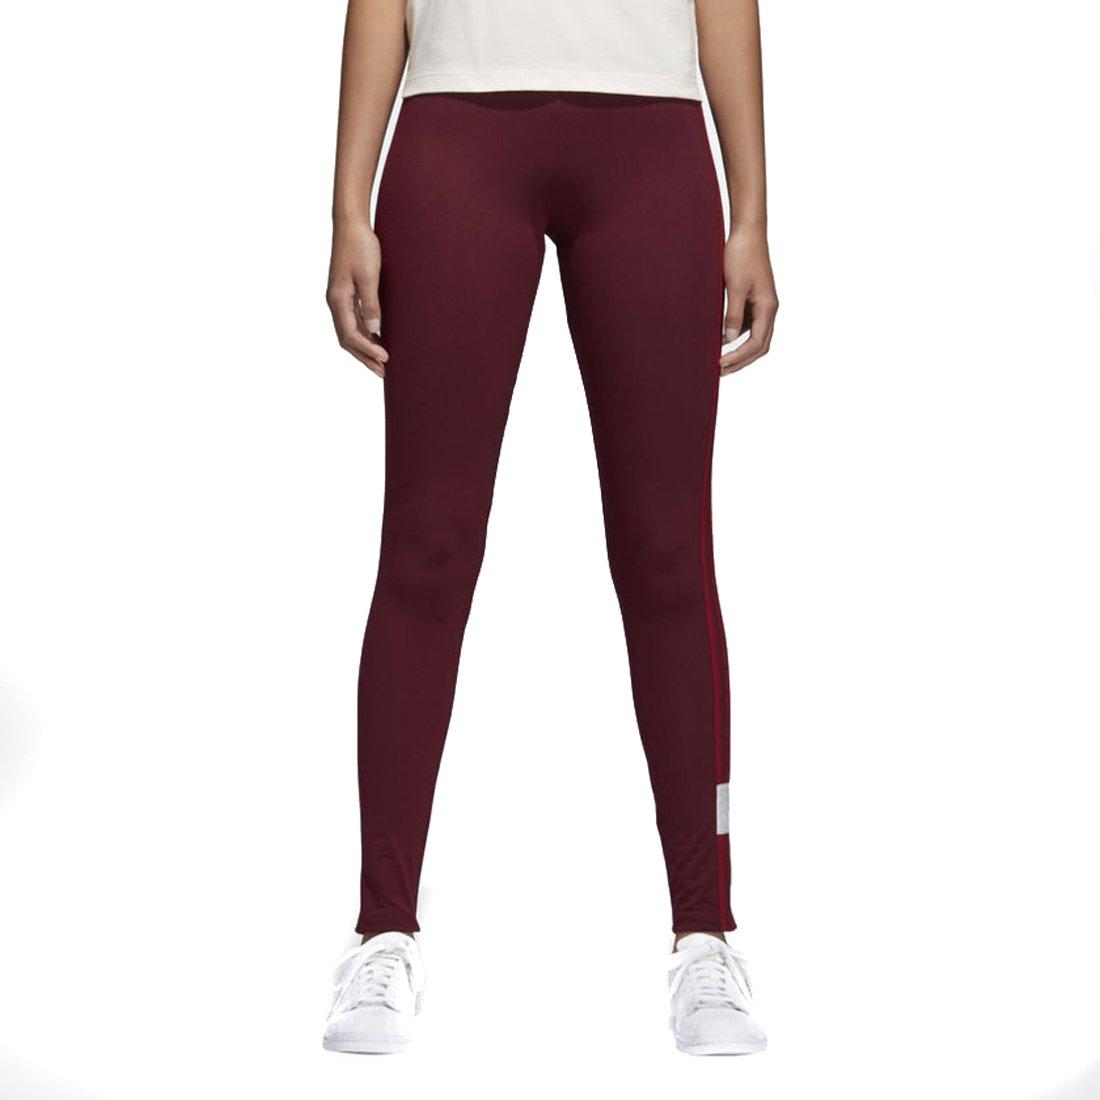 f2304b4ec956c Top 10 wholesale Side Zip Leggings - Chinabrands.com